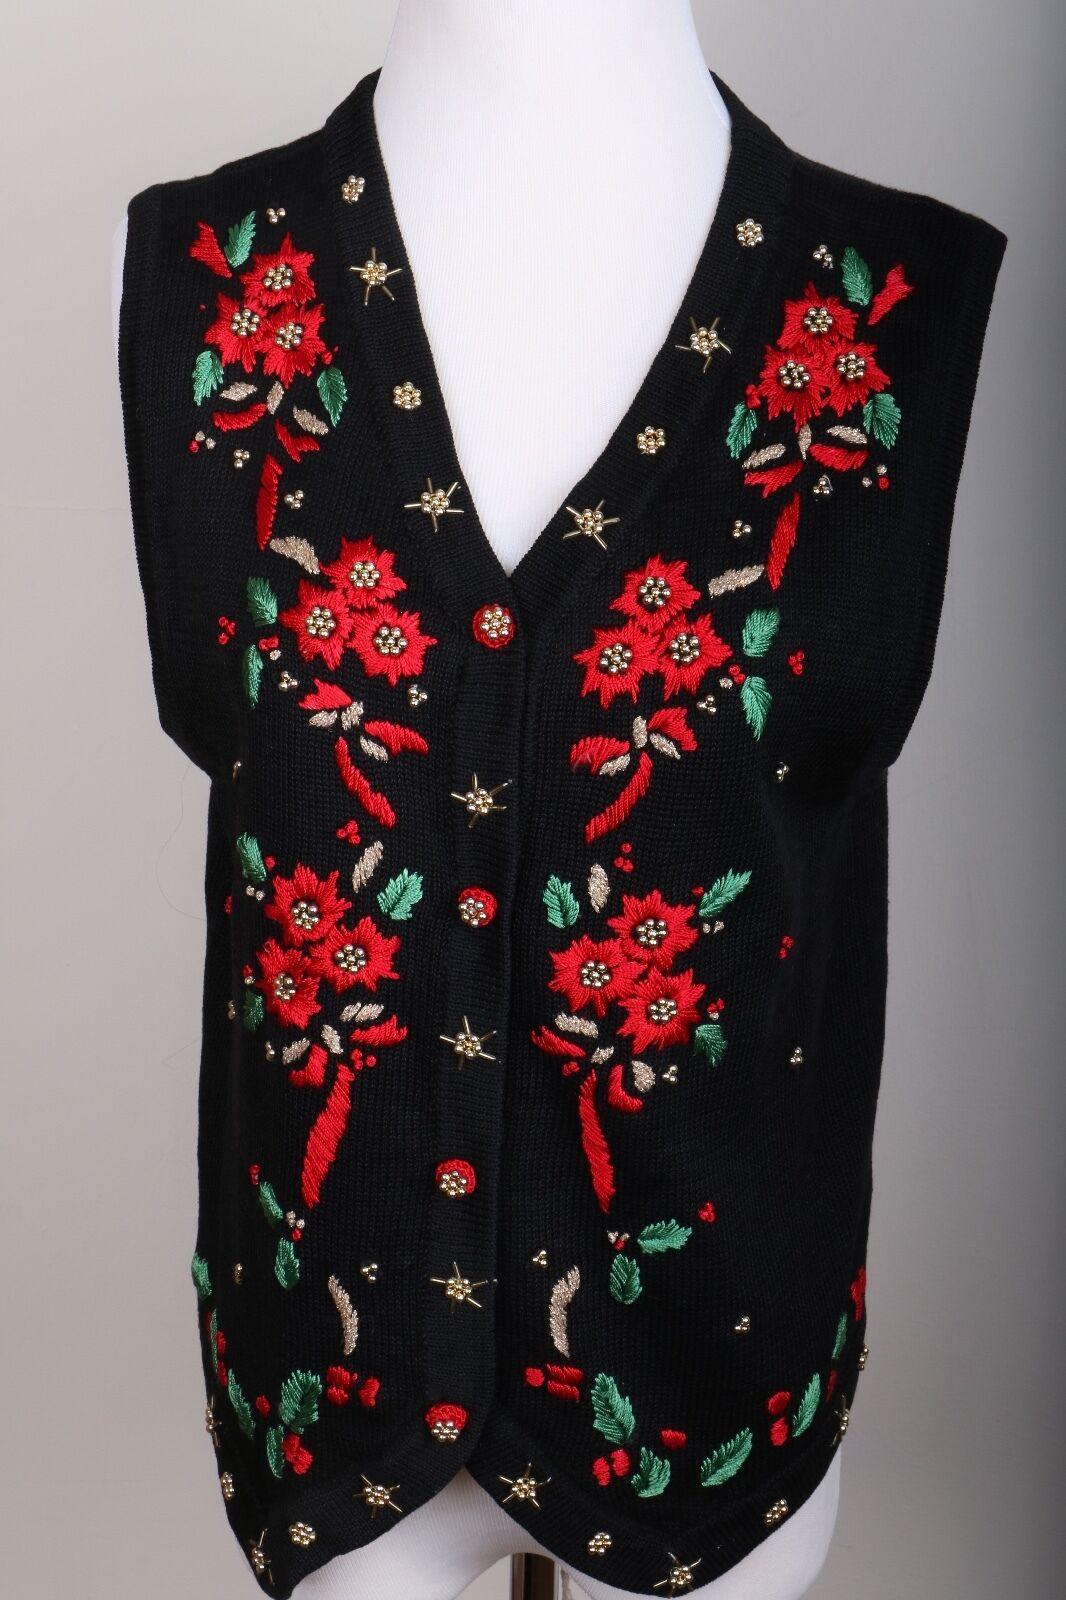 Arriviste Christmas Cardigan Sweater Vest Poinsettia Size Petite M